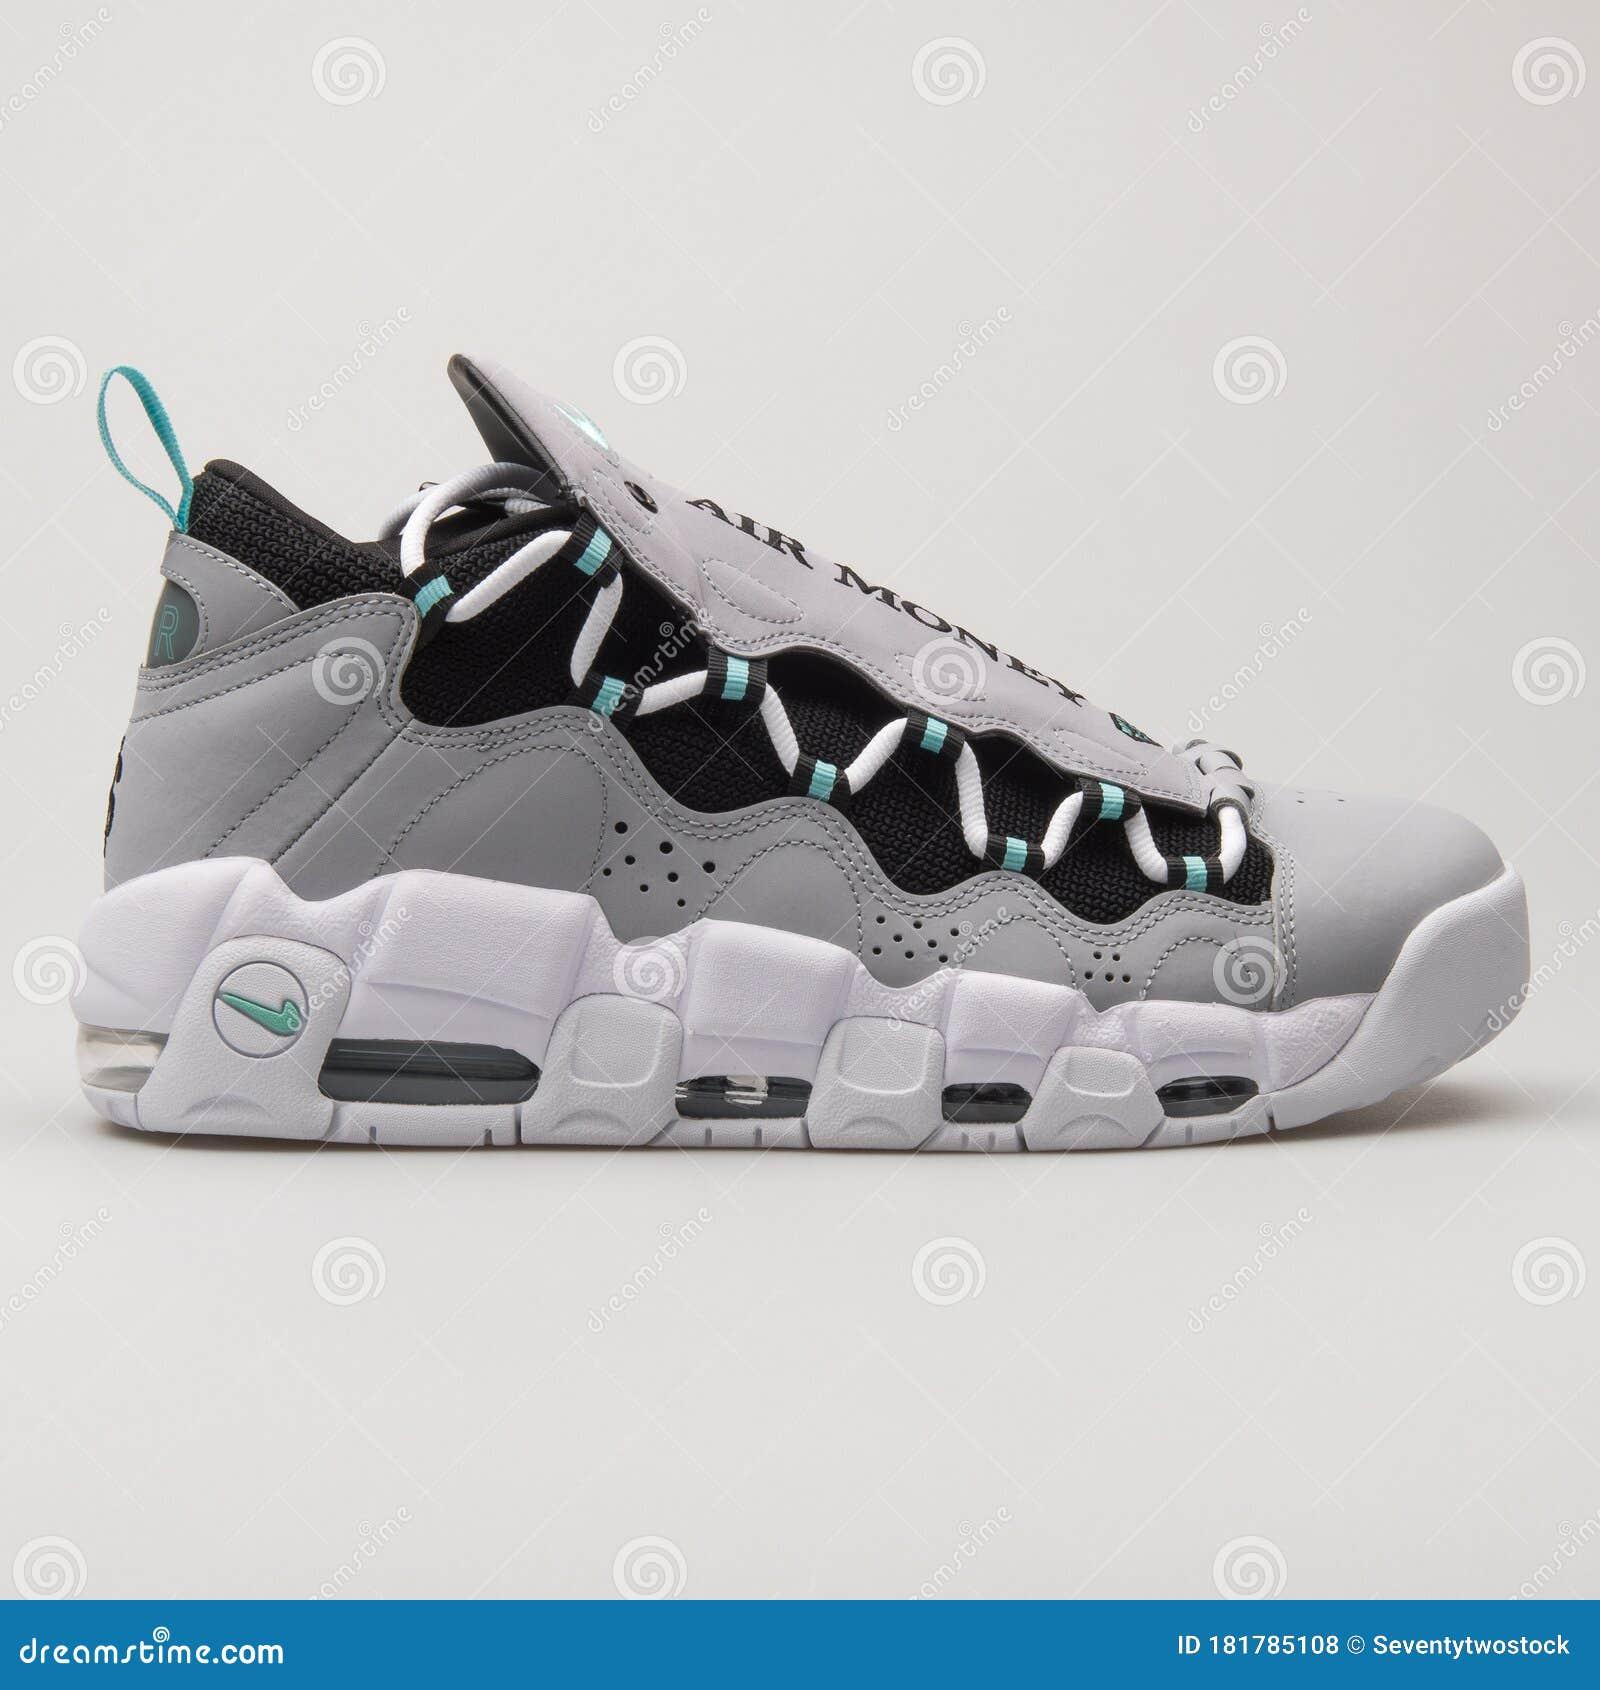 Nike Air More Money Grey, Green, Black